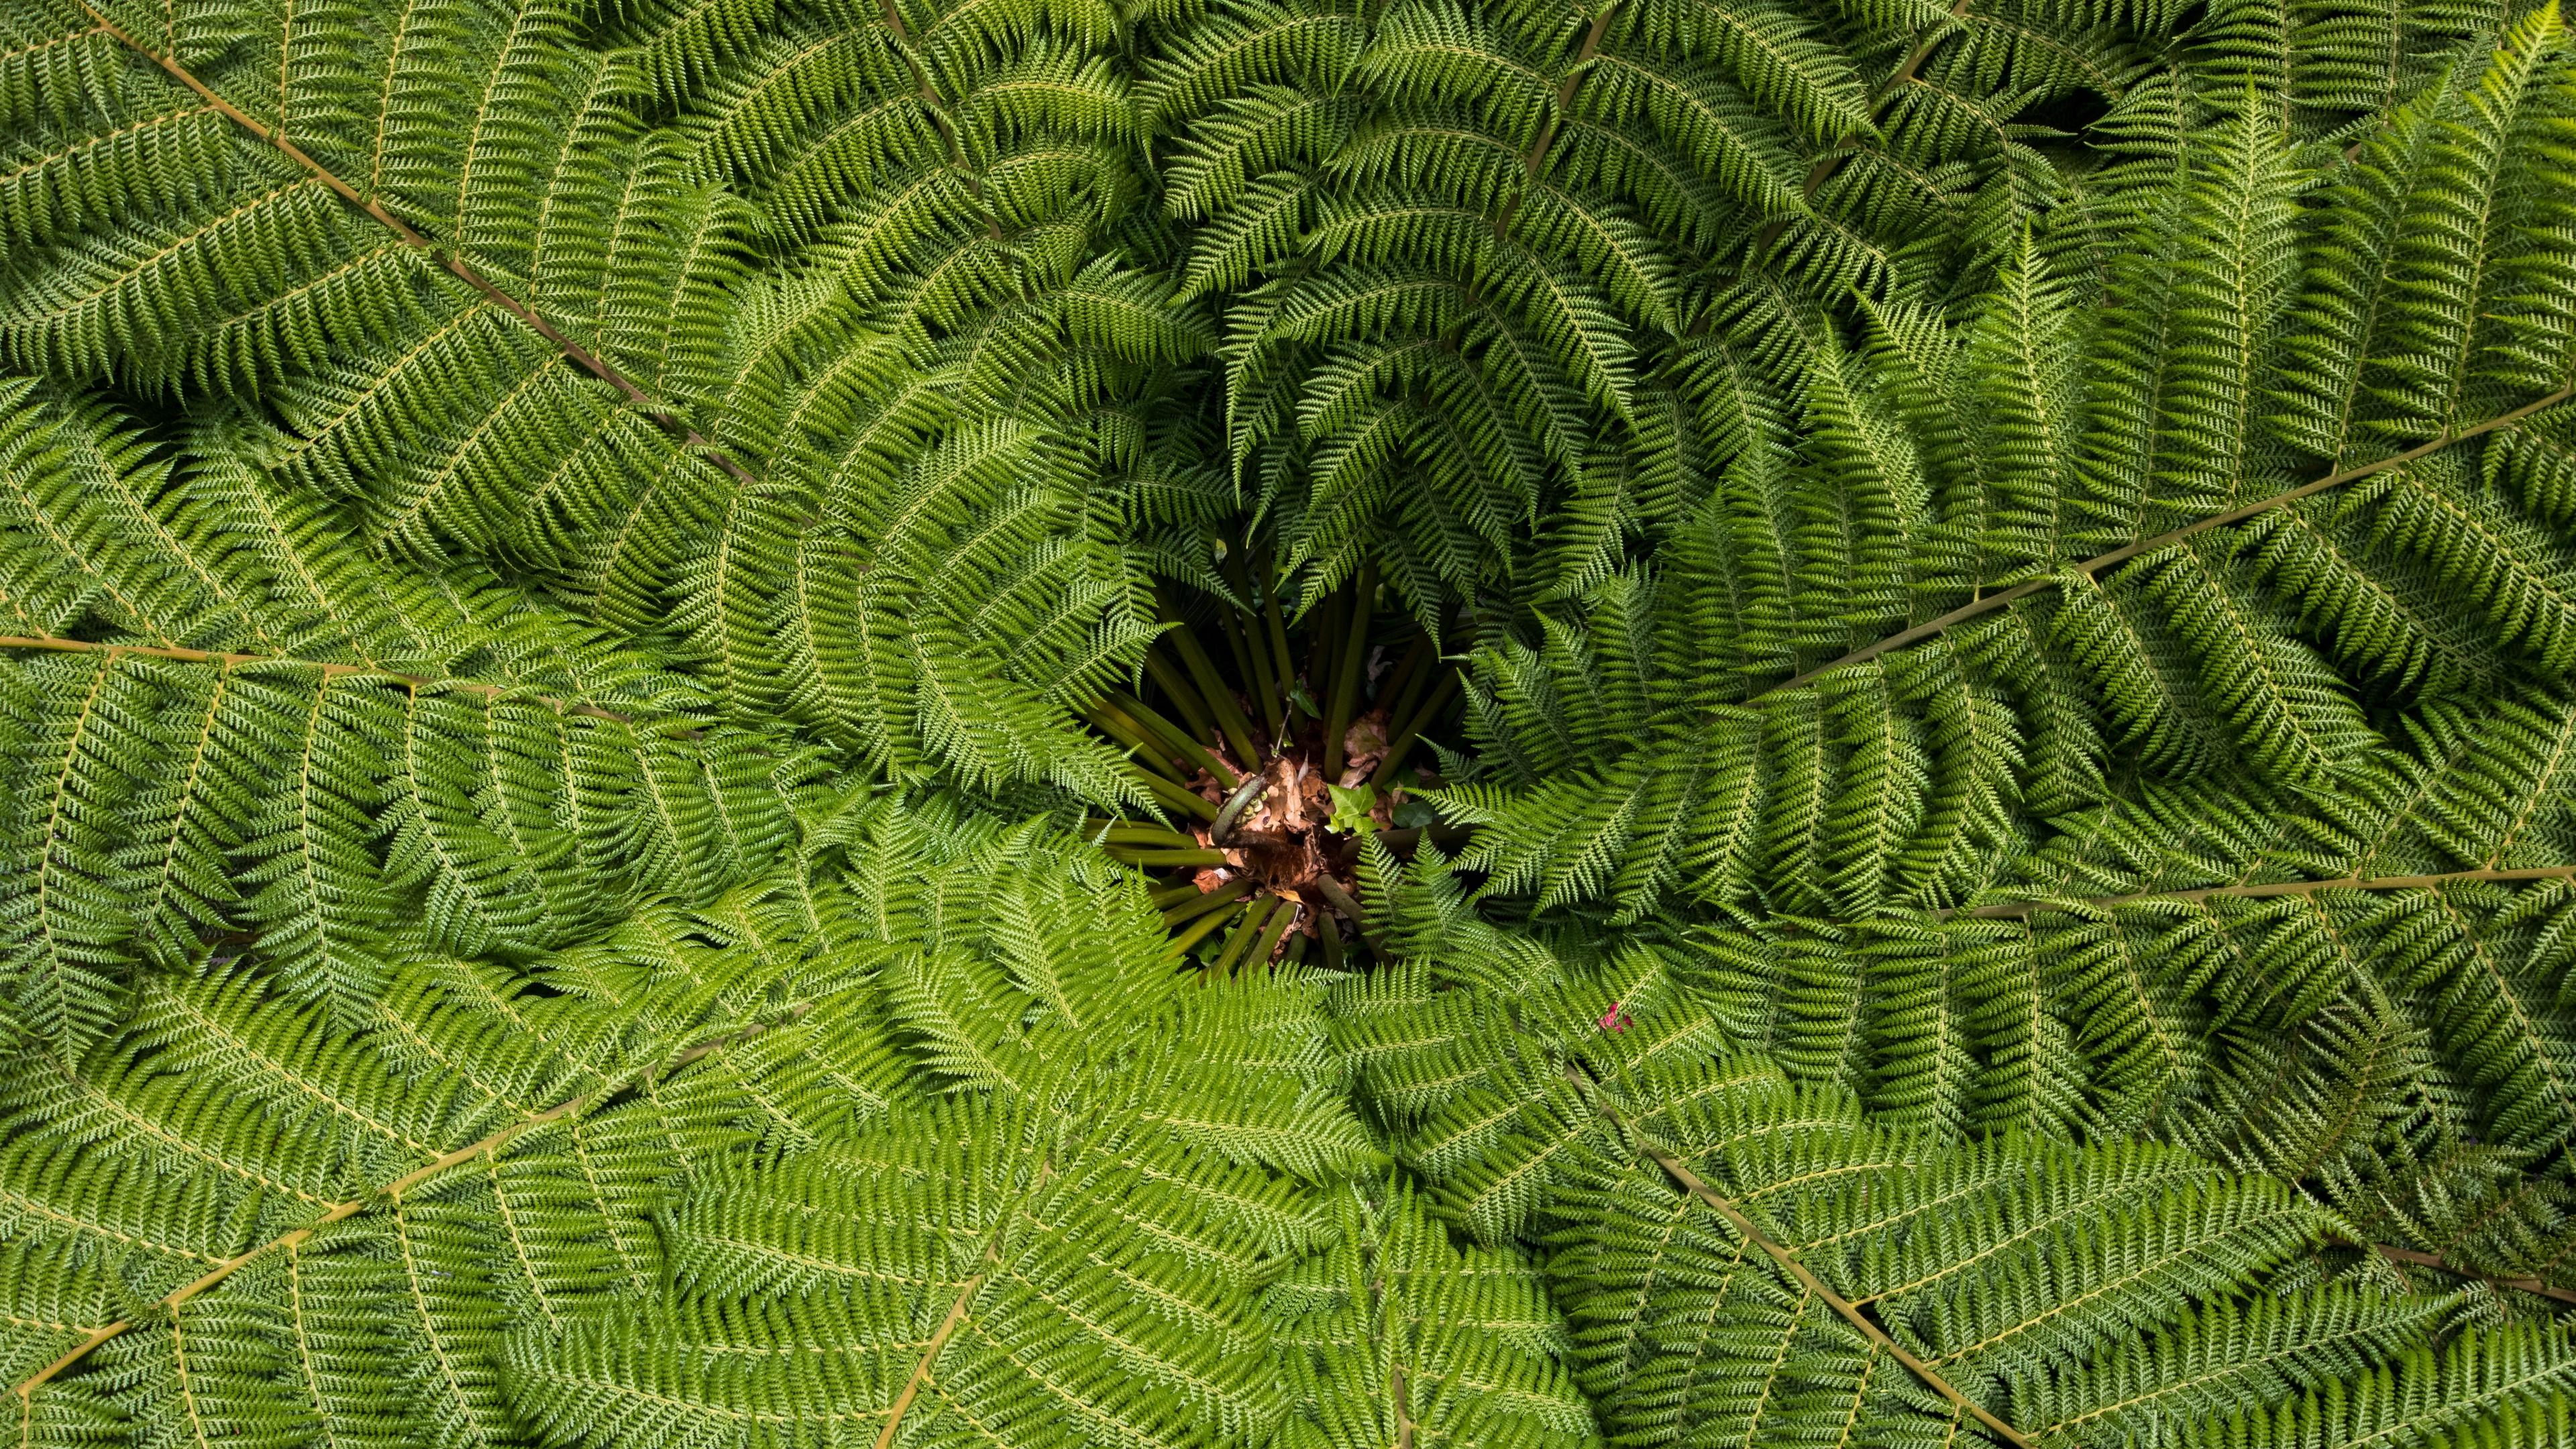 ostrich fern fern leaves carved plant green vegetation 4k 1541117196 - ostrich fern, fern, leaves, carved, plant, green, vegetation 4k - ostrich fern, Leaves, fern